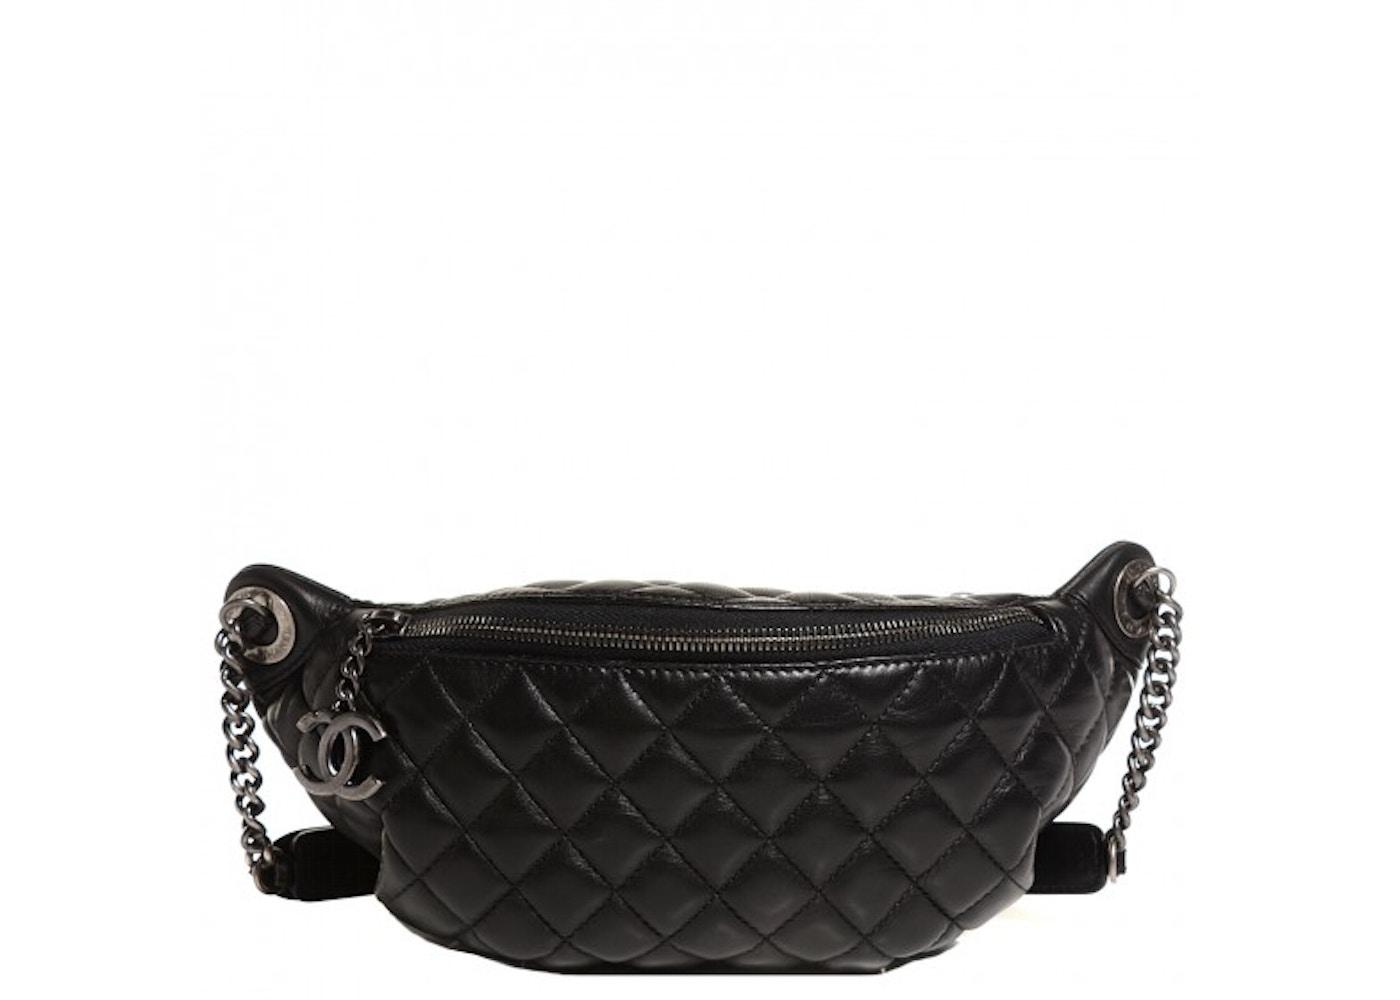 00e2df889e Chanel Waist Bag Quilted Black